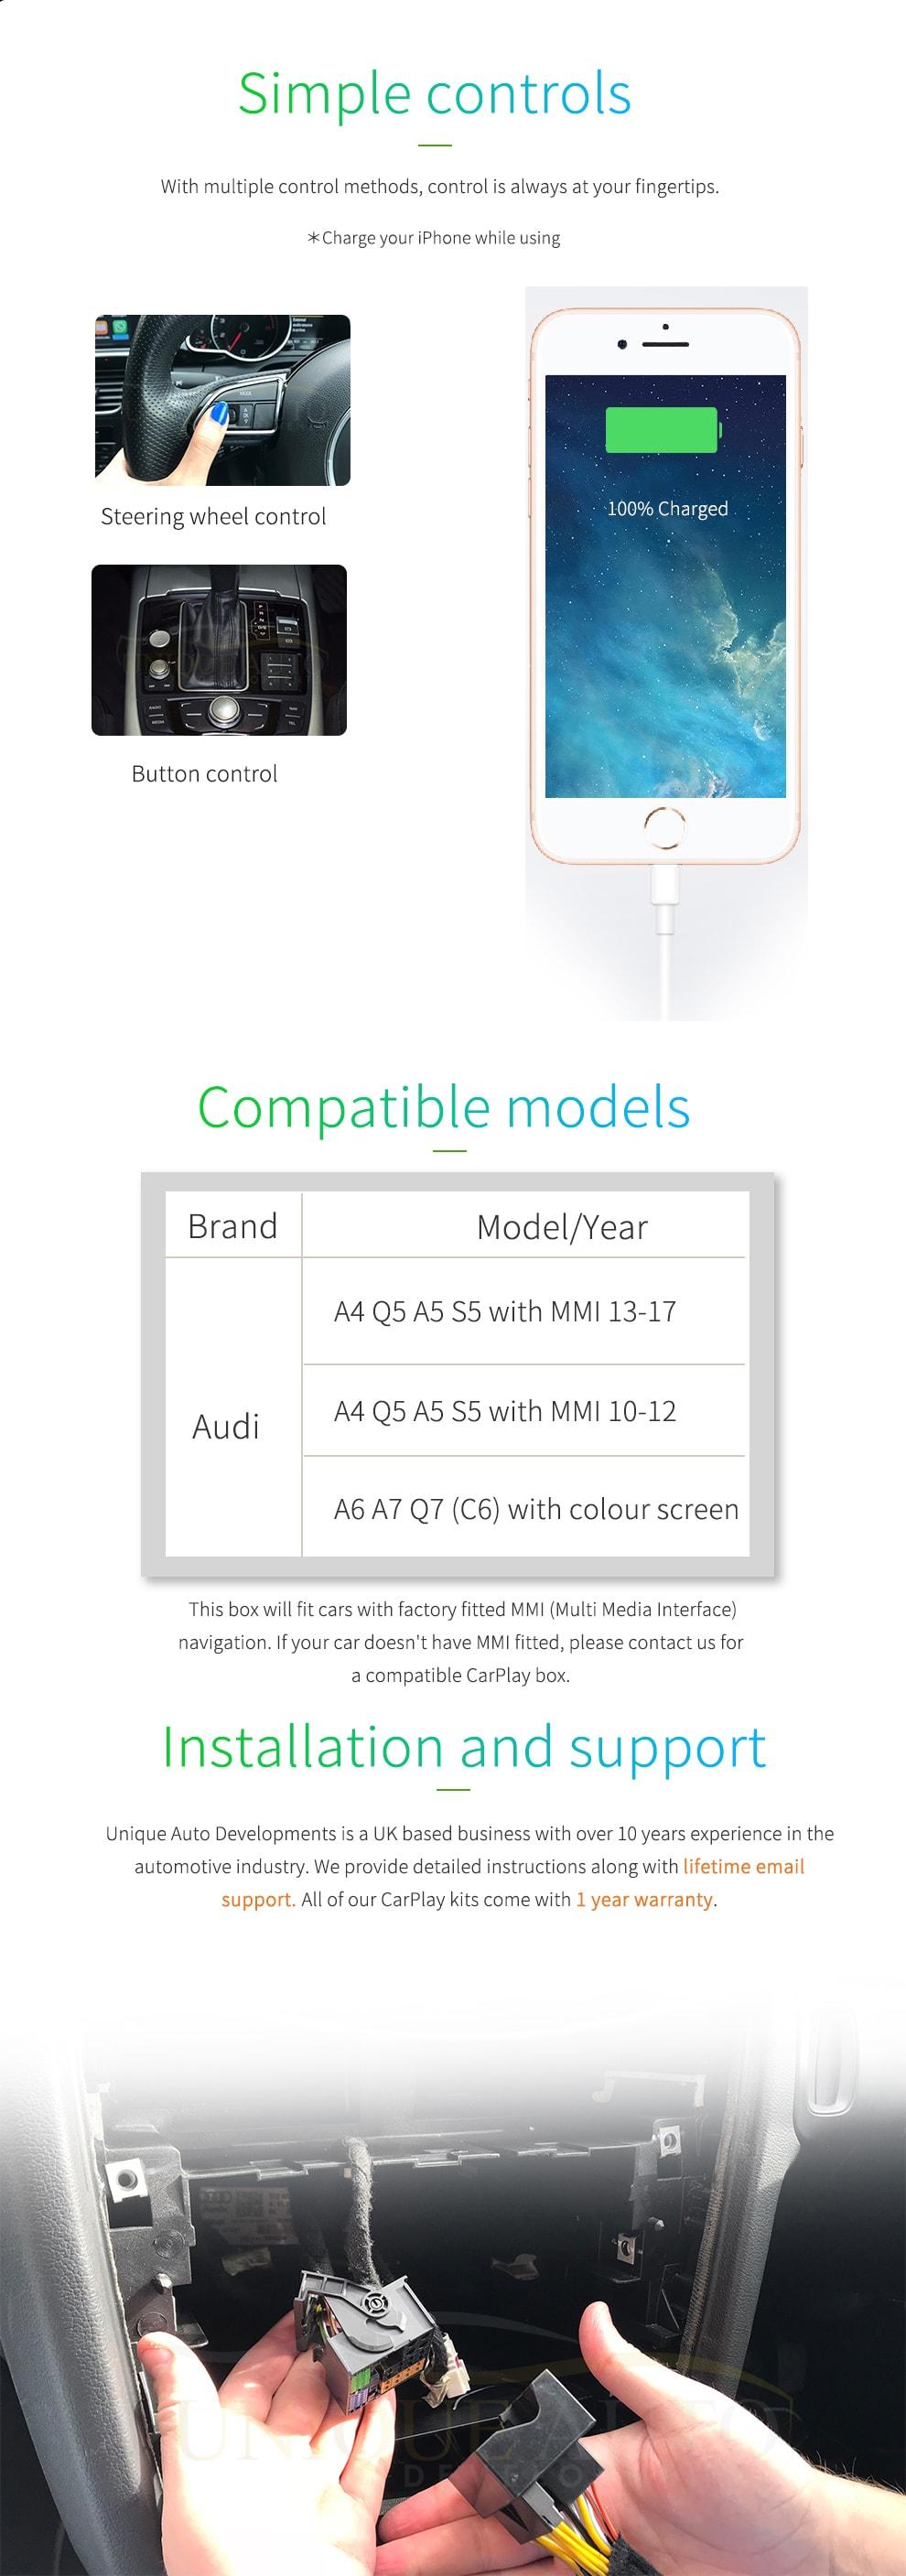 Carplay Navigation Audi A6 C6 Q7 2009 2011 Gps Mmi Unique Auto Wiring Diagram Key Advantages Of The Developments Kit Include